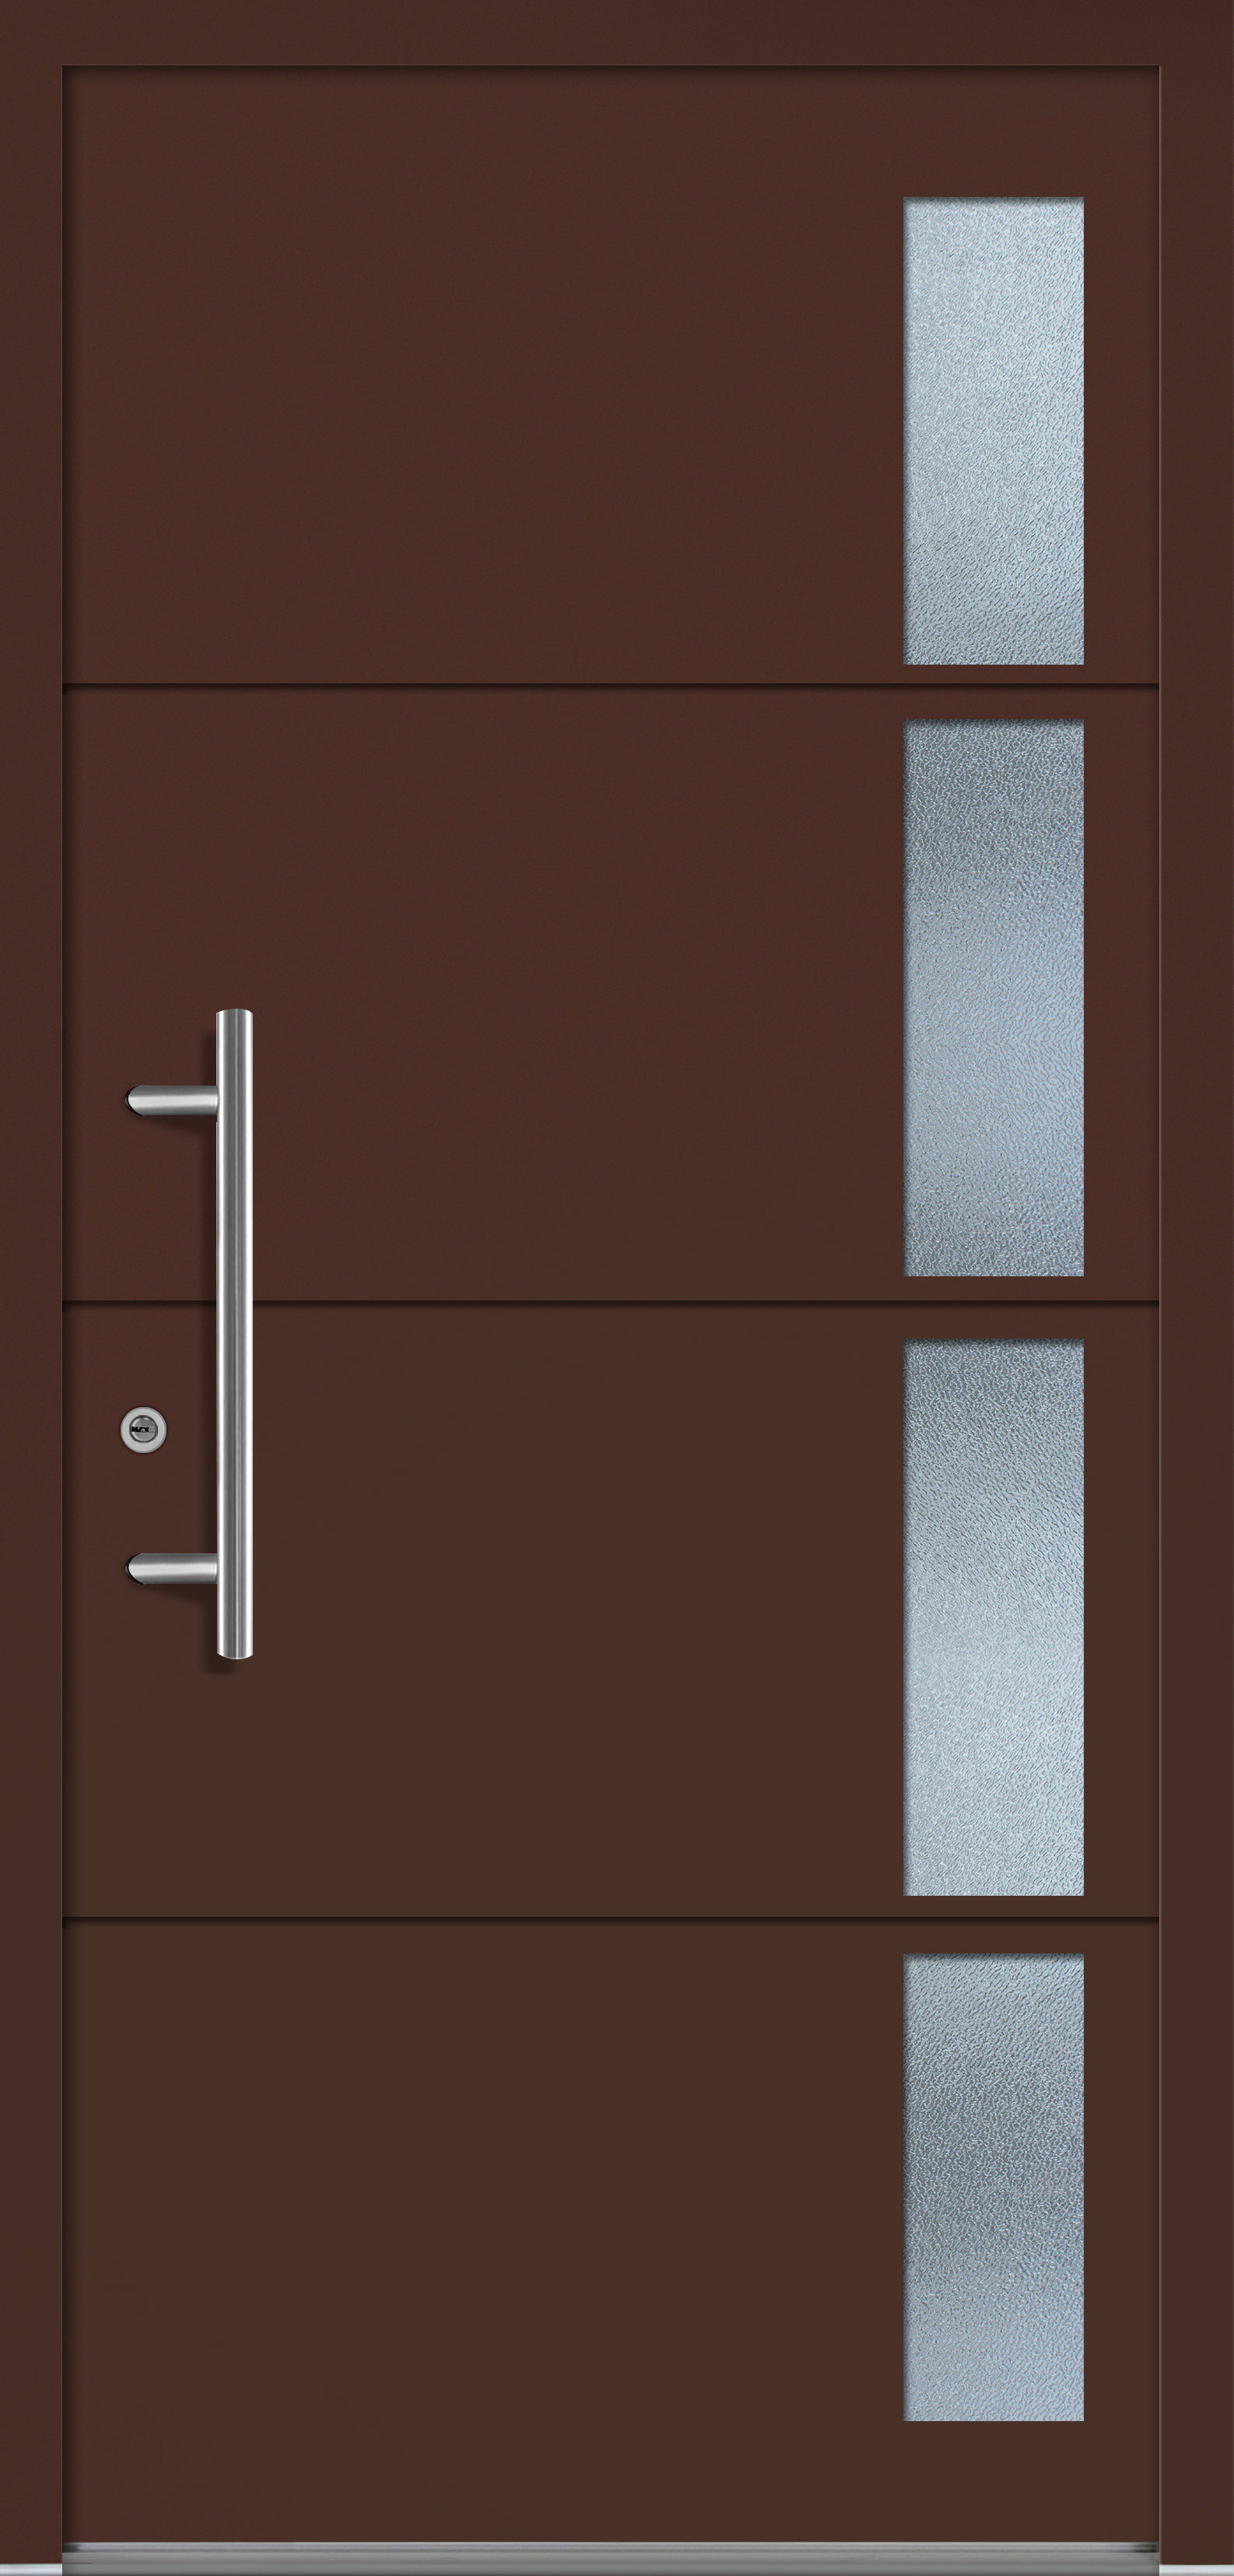 haust r rhea exclusive aluminiumt r eingangst r nebeneingangst r wohnungst r ebay. Black Bedroom Furniture Sets. Home Design Ideas